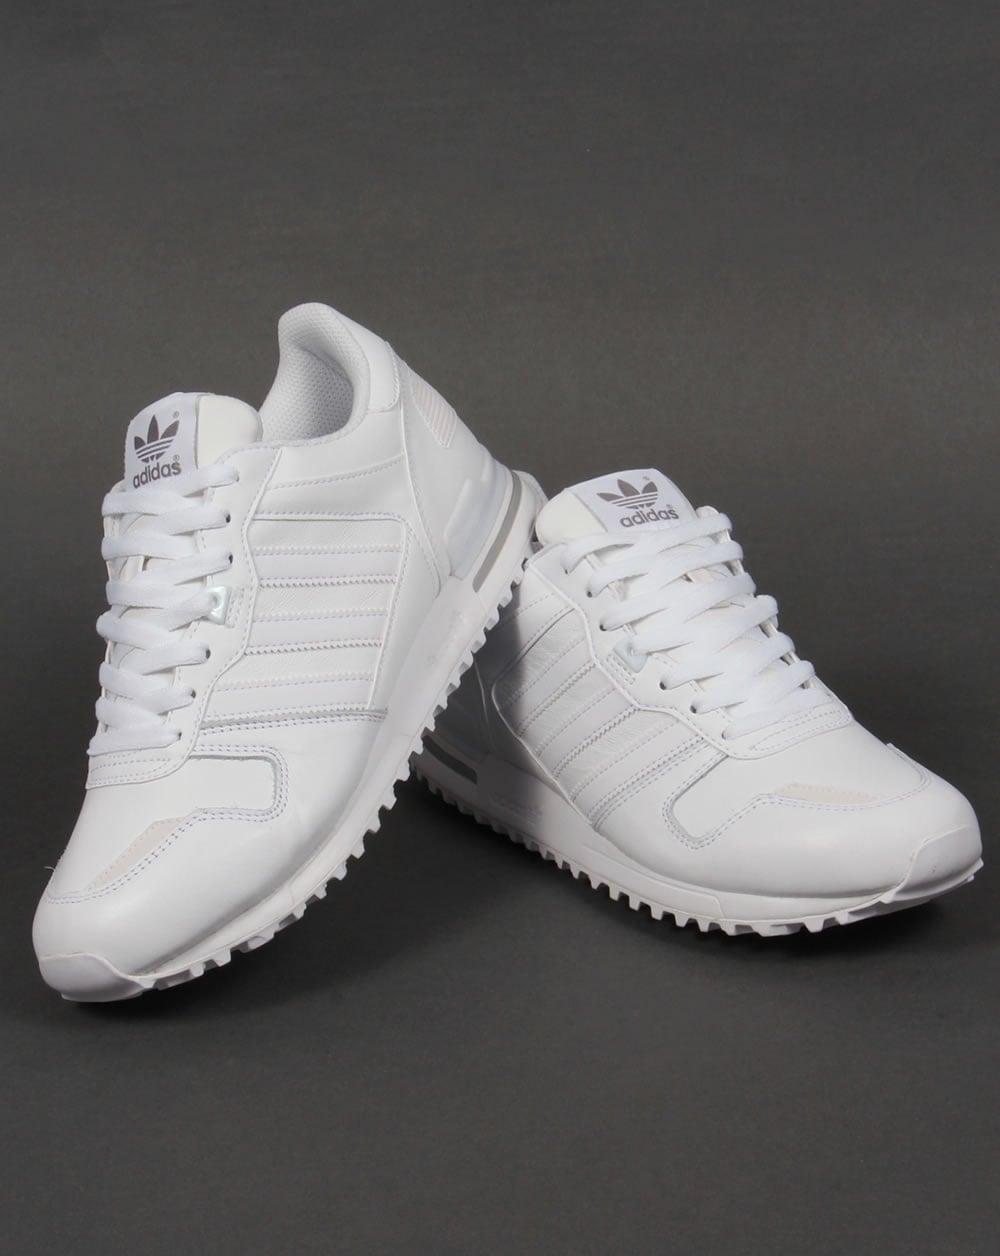 Adidas Originals Zx 700 Formatori In Bianco 2zRyH